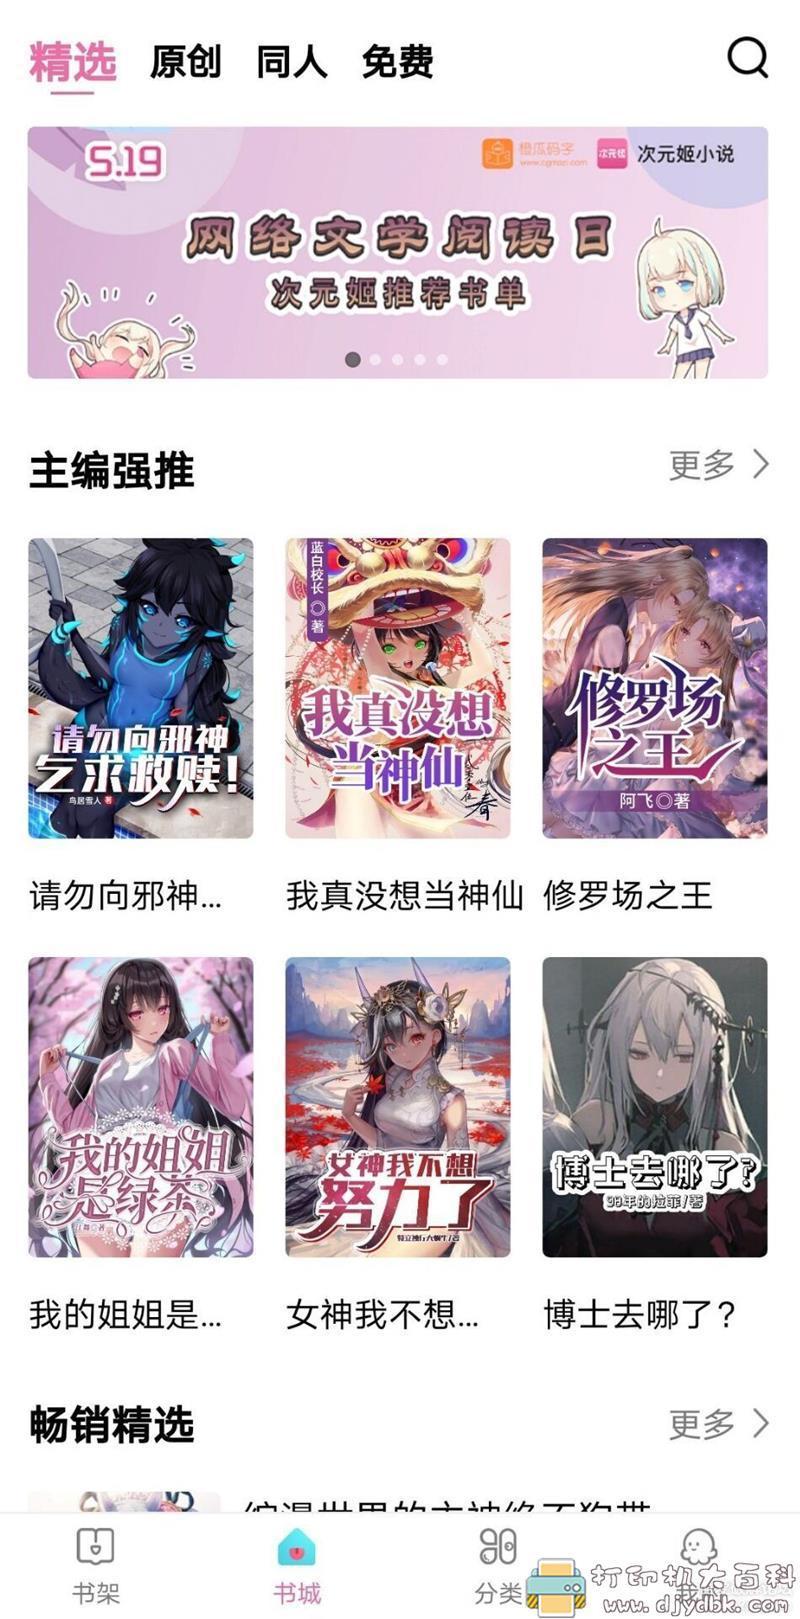 [Android]免费看小说:次元姬小说1.1.1最新版 配图 No.1